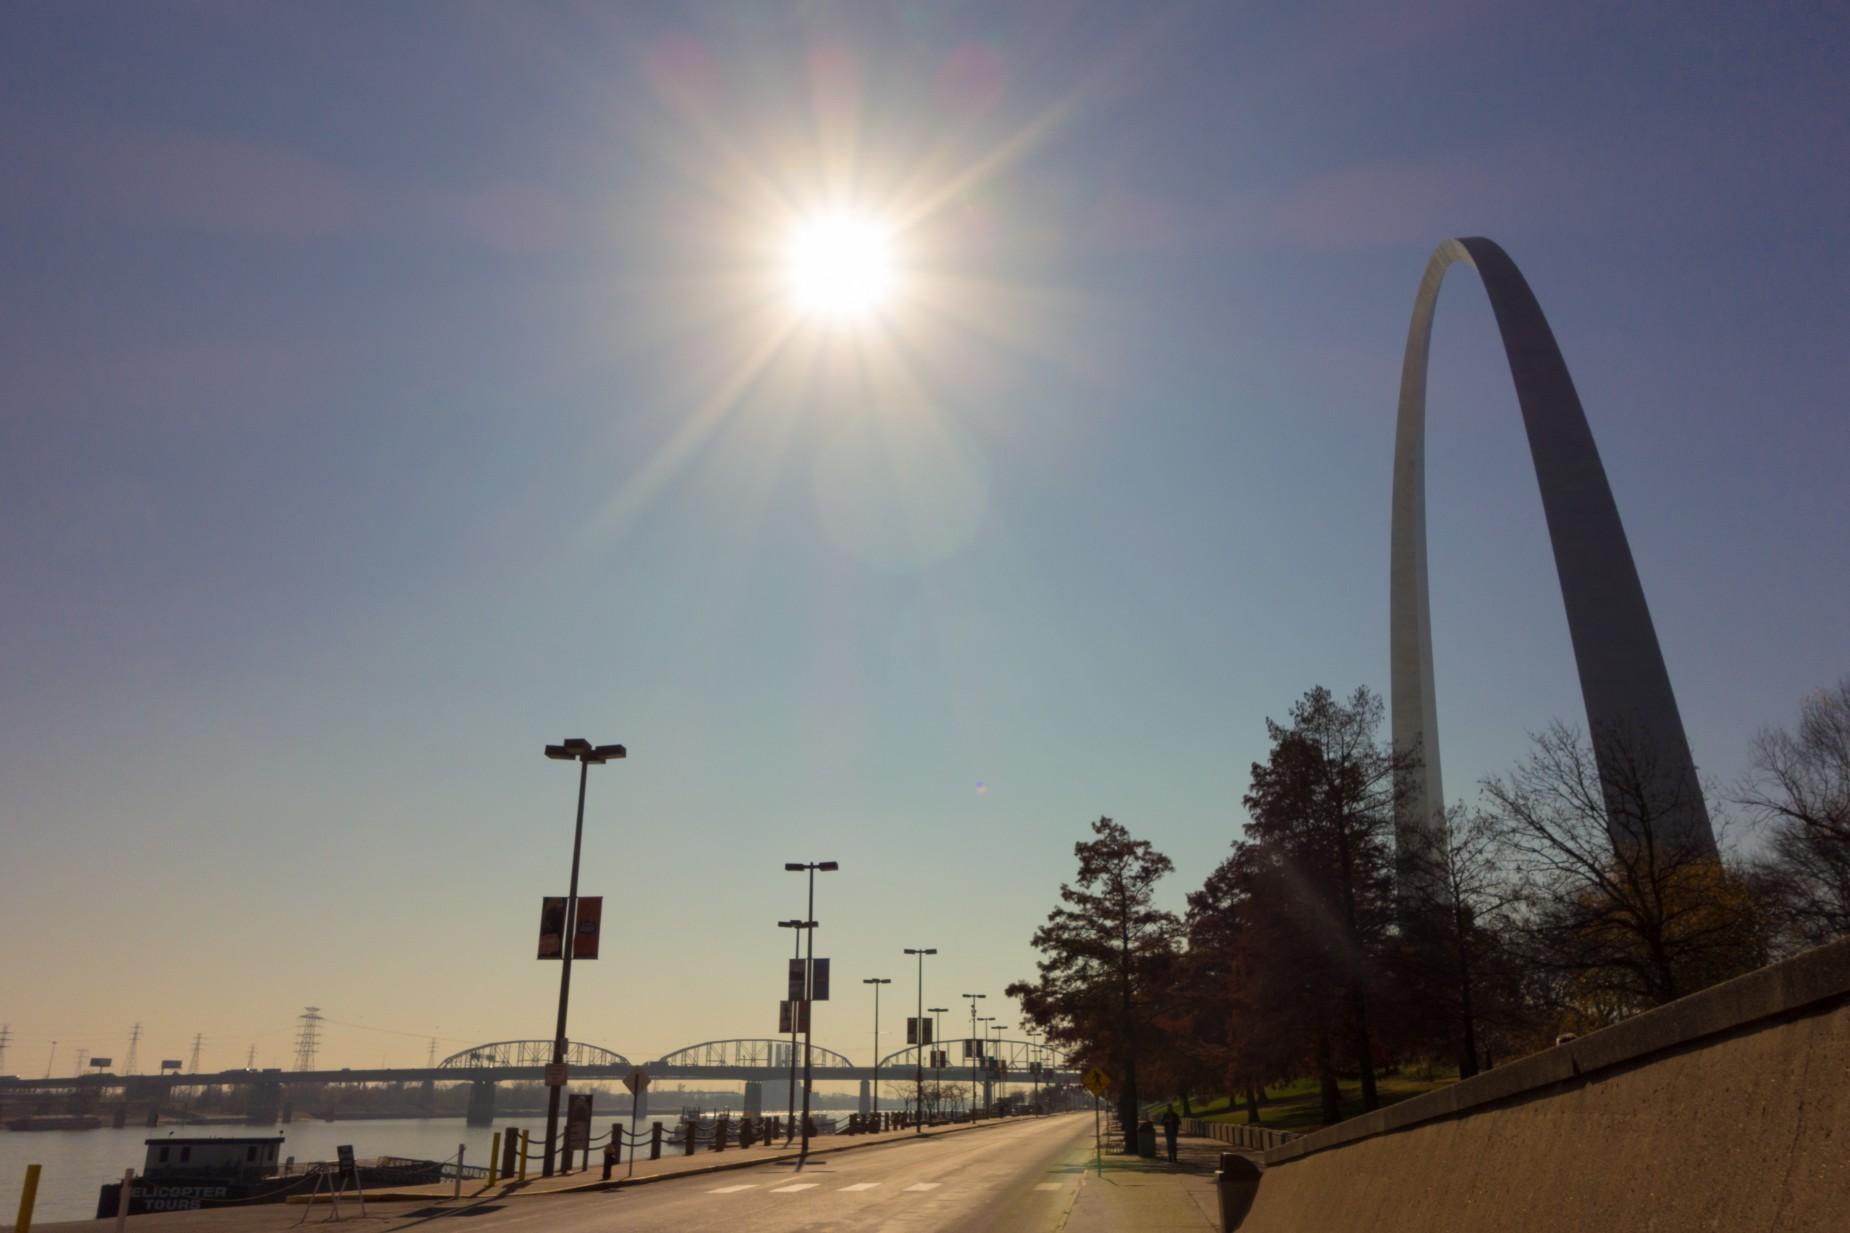 St-Louis-Bicycling-Riverview-Trail-10-1-1850x1233.jpg